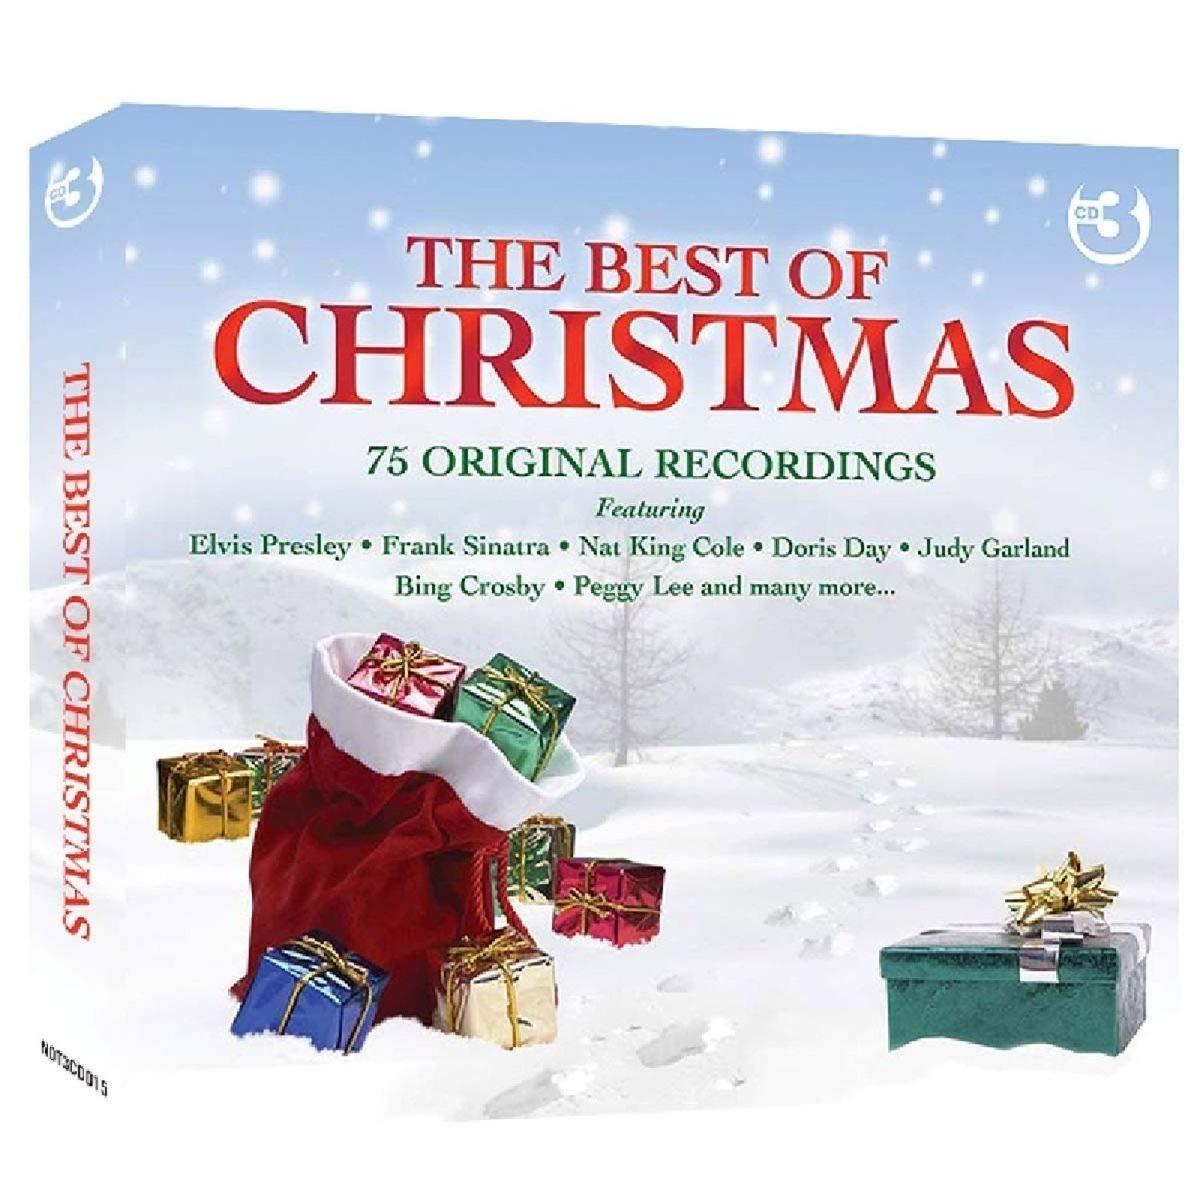 Best of Christmas-75 Original Recordings - Various: Amazon.de: Musik